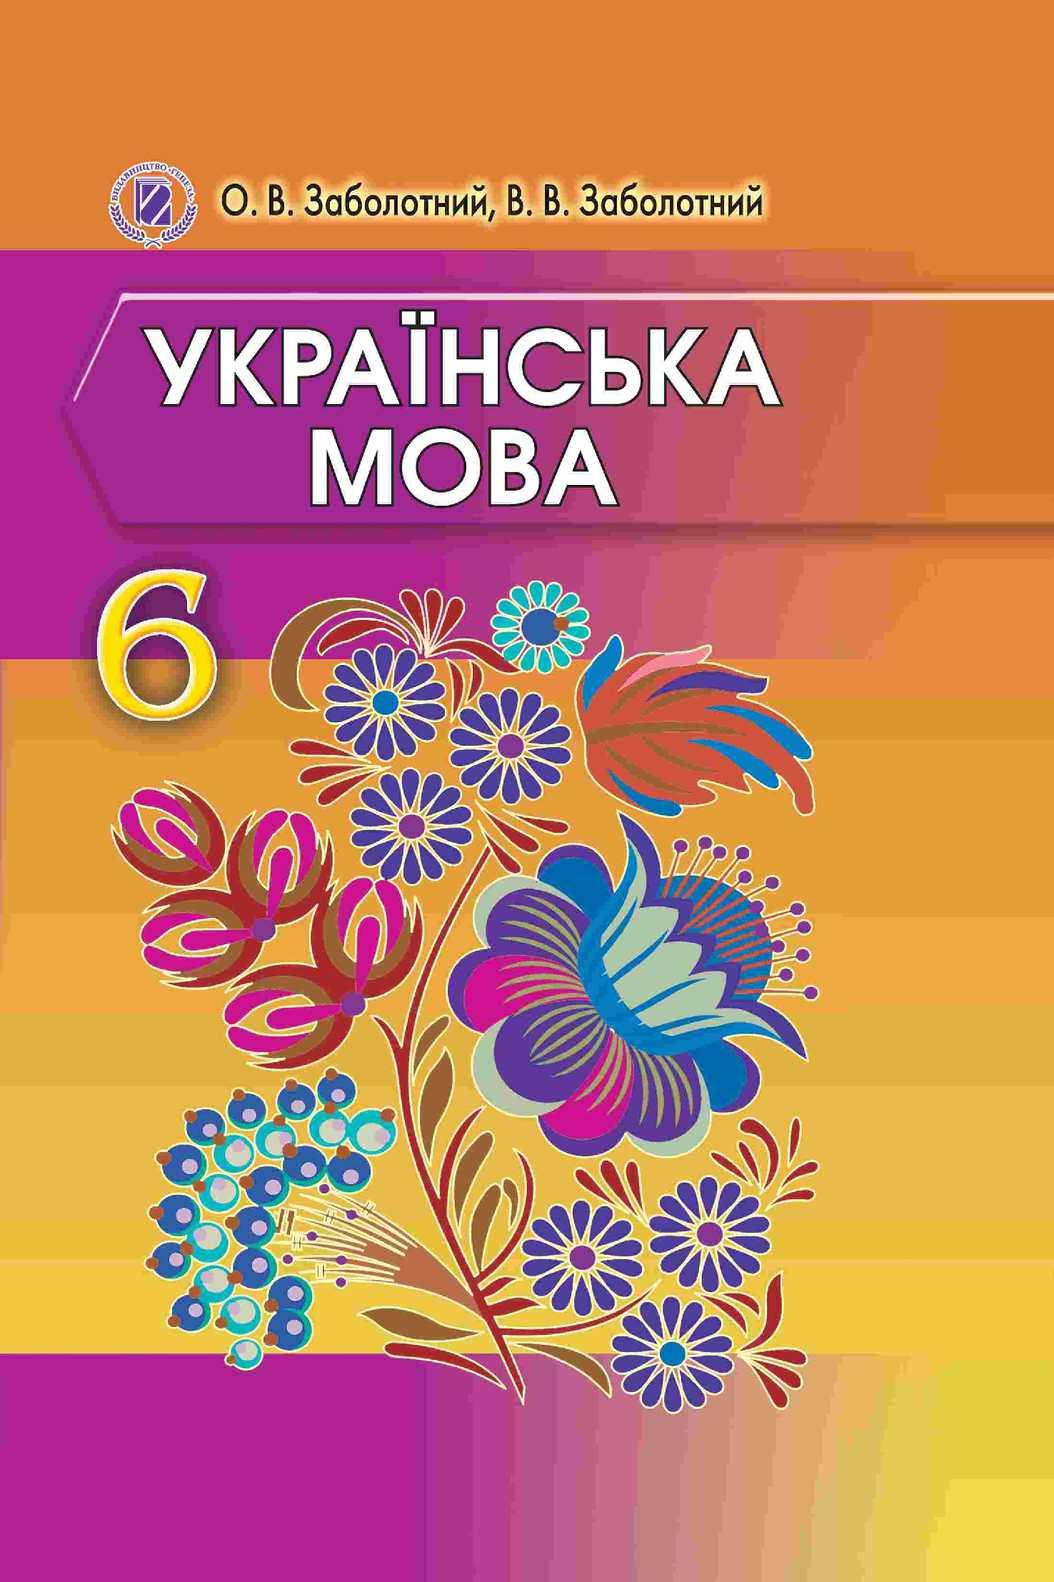 Calaméo - Українська мова 6 клас Заболотний 2014 a8a0c31ba2de4